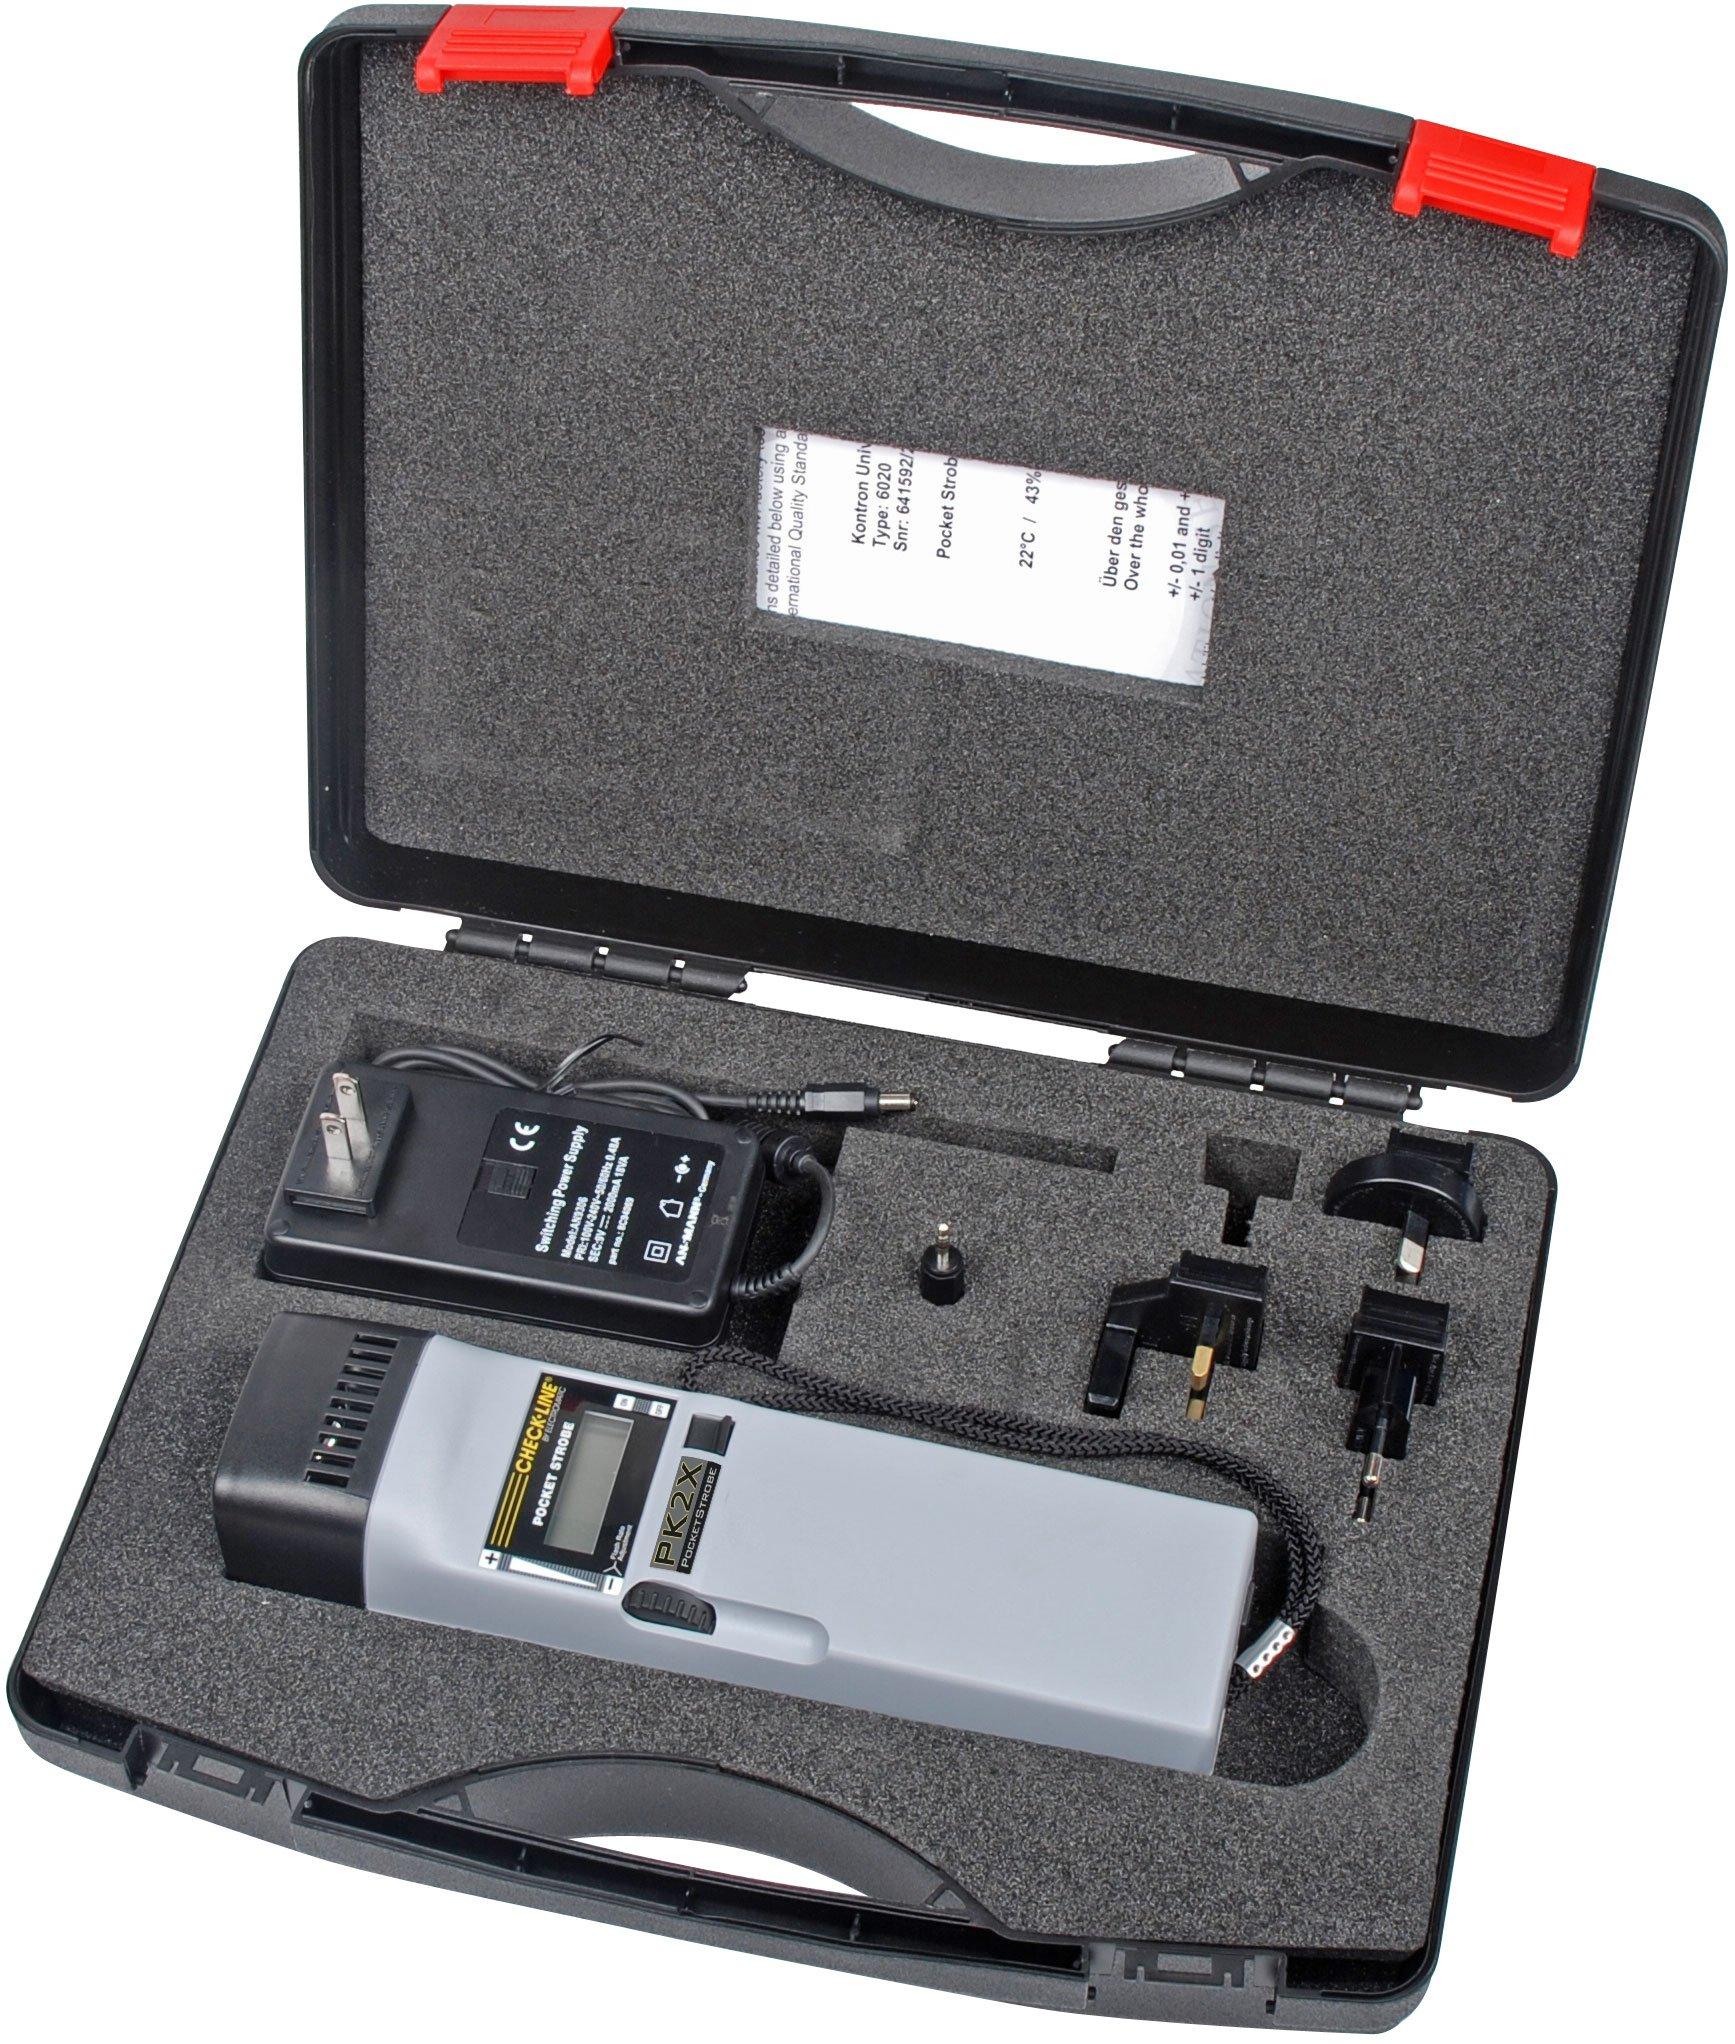 PK2X Pocket-Strobe Stroboscope, Flash Range: 30 - 12,500 FPM, Flash Brightness: 1200 Lux, Complete Kit by Checkline